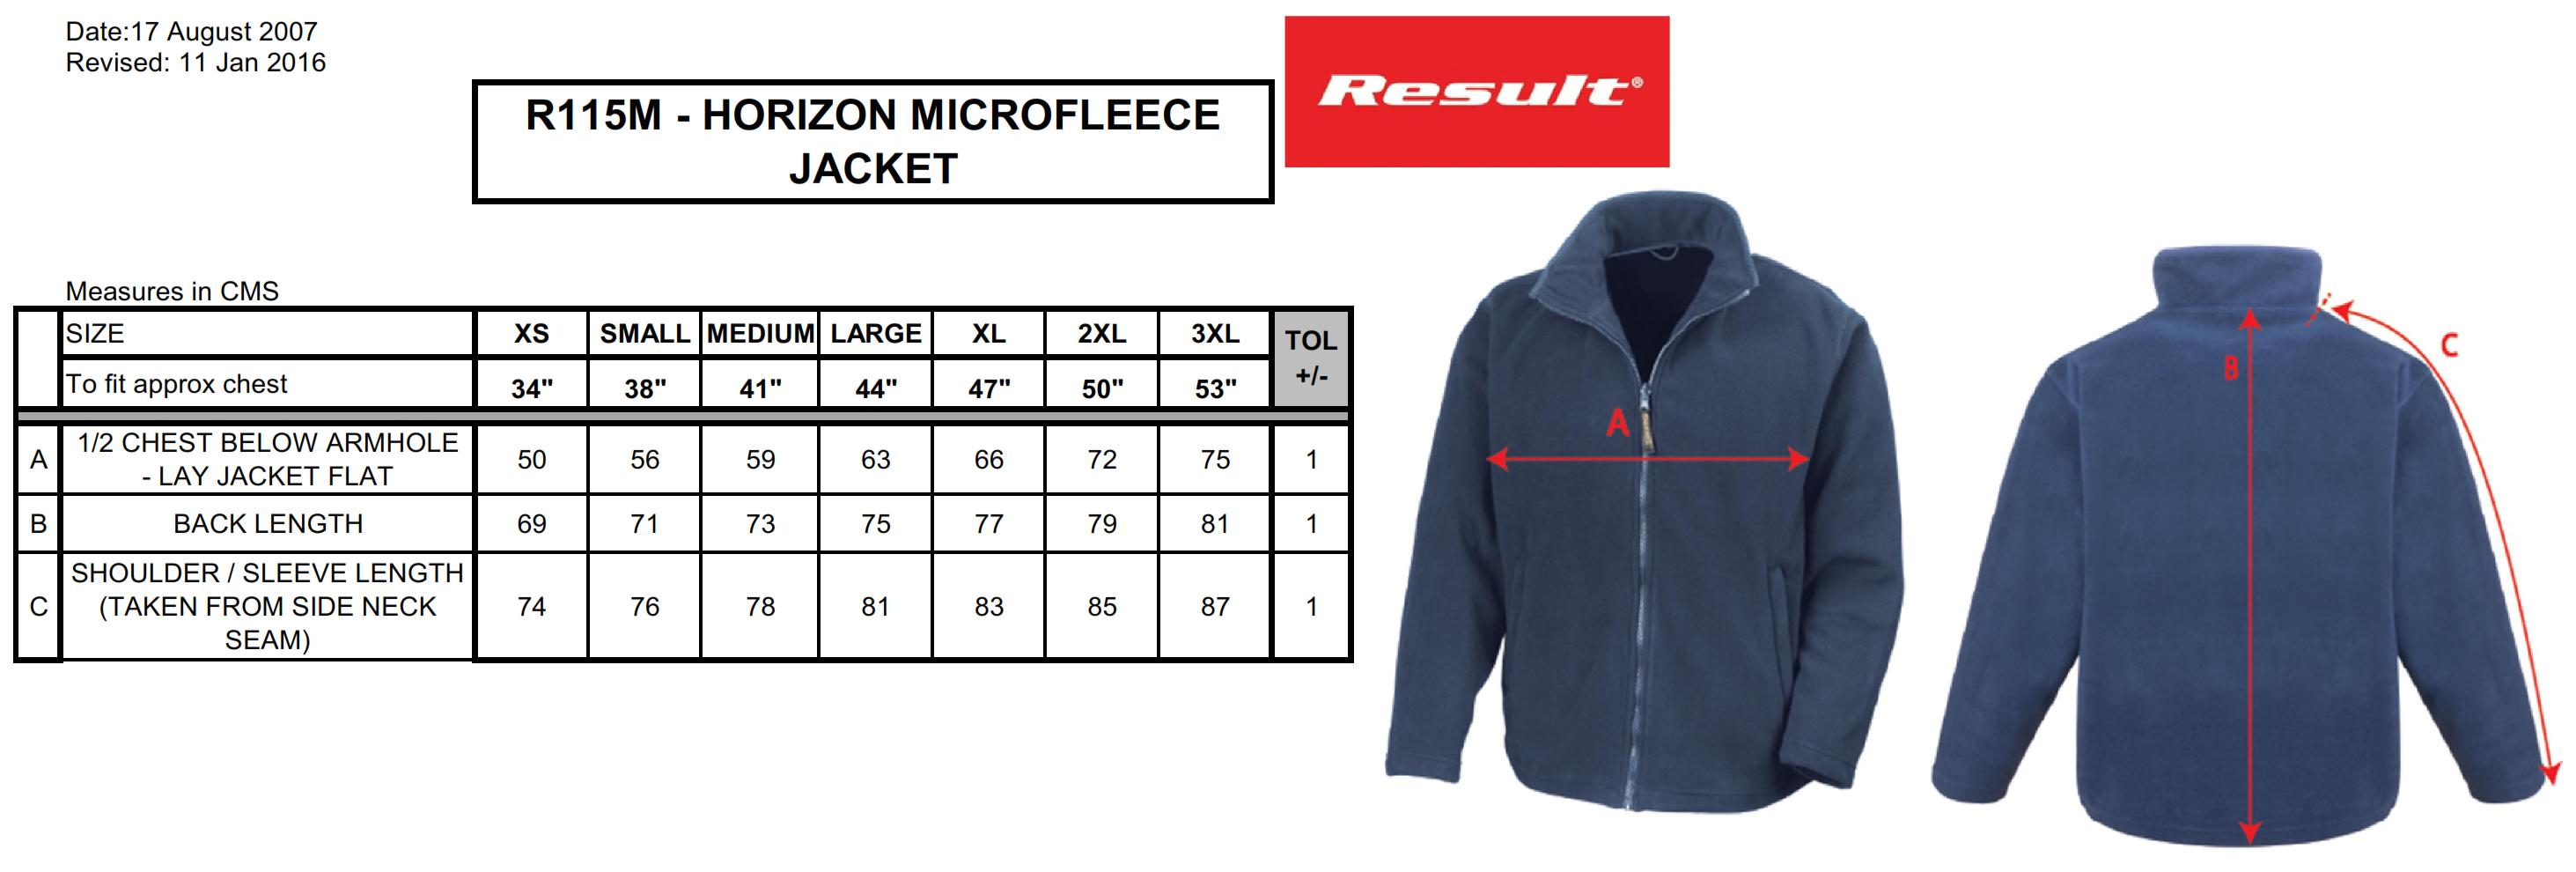 Result: Microfleece Jacket Horizon R115M